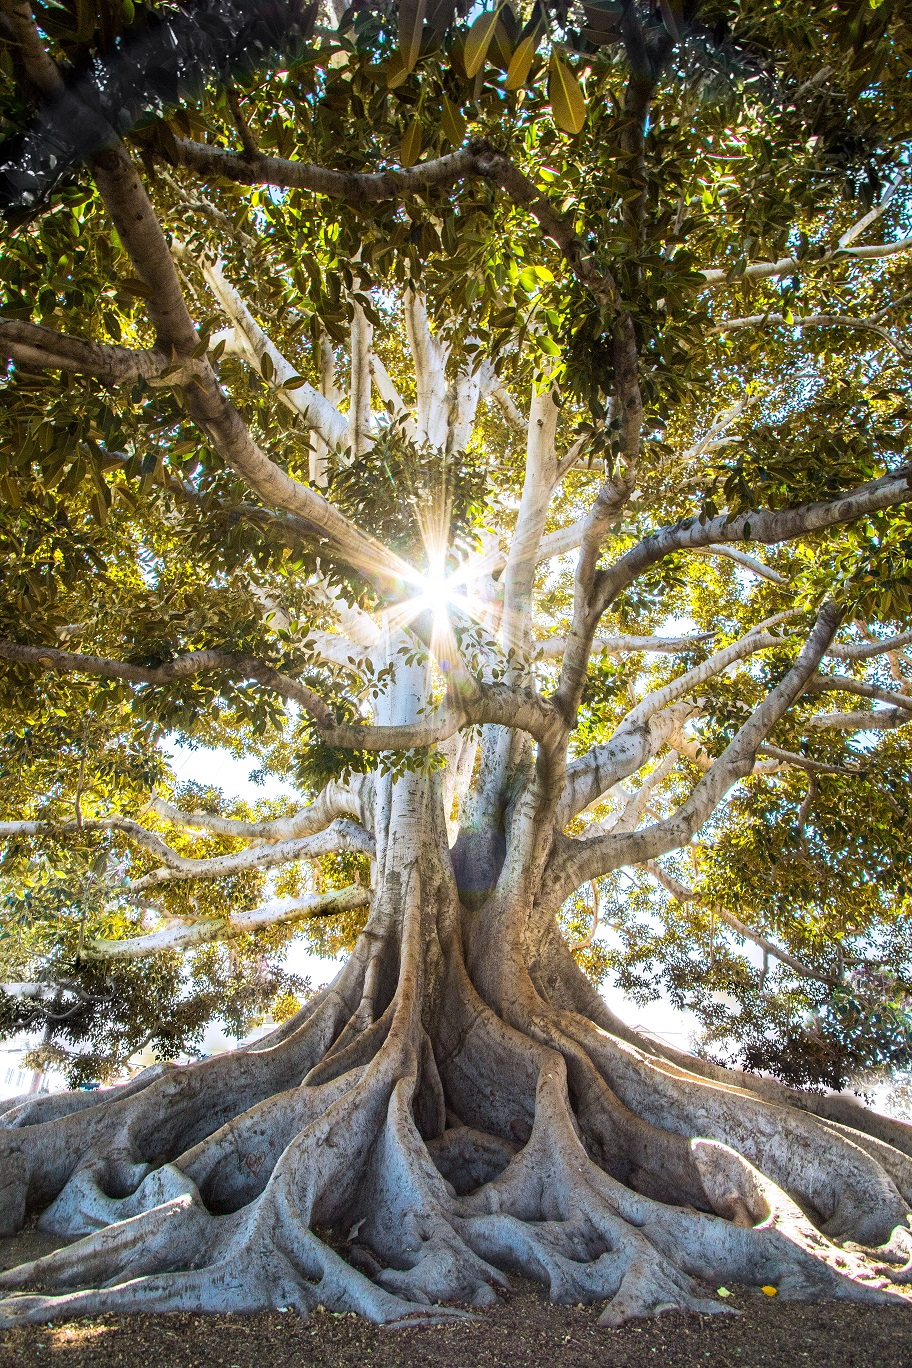 tree healing power, self healing, 個人成長,自我療癒, 樹木